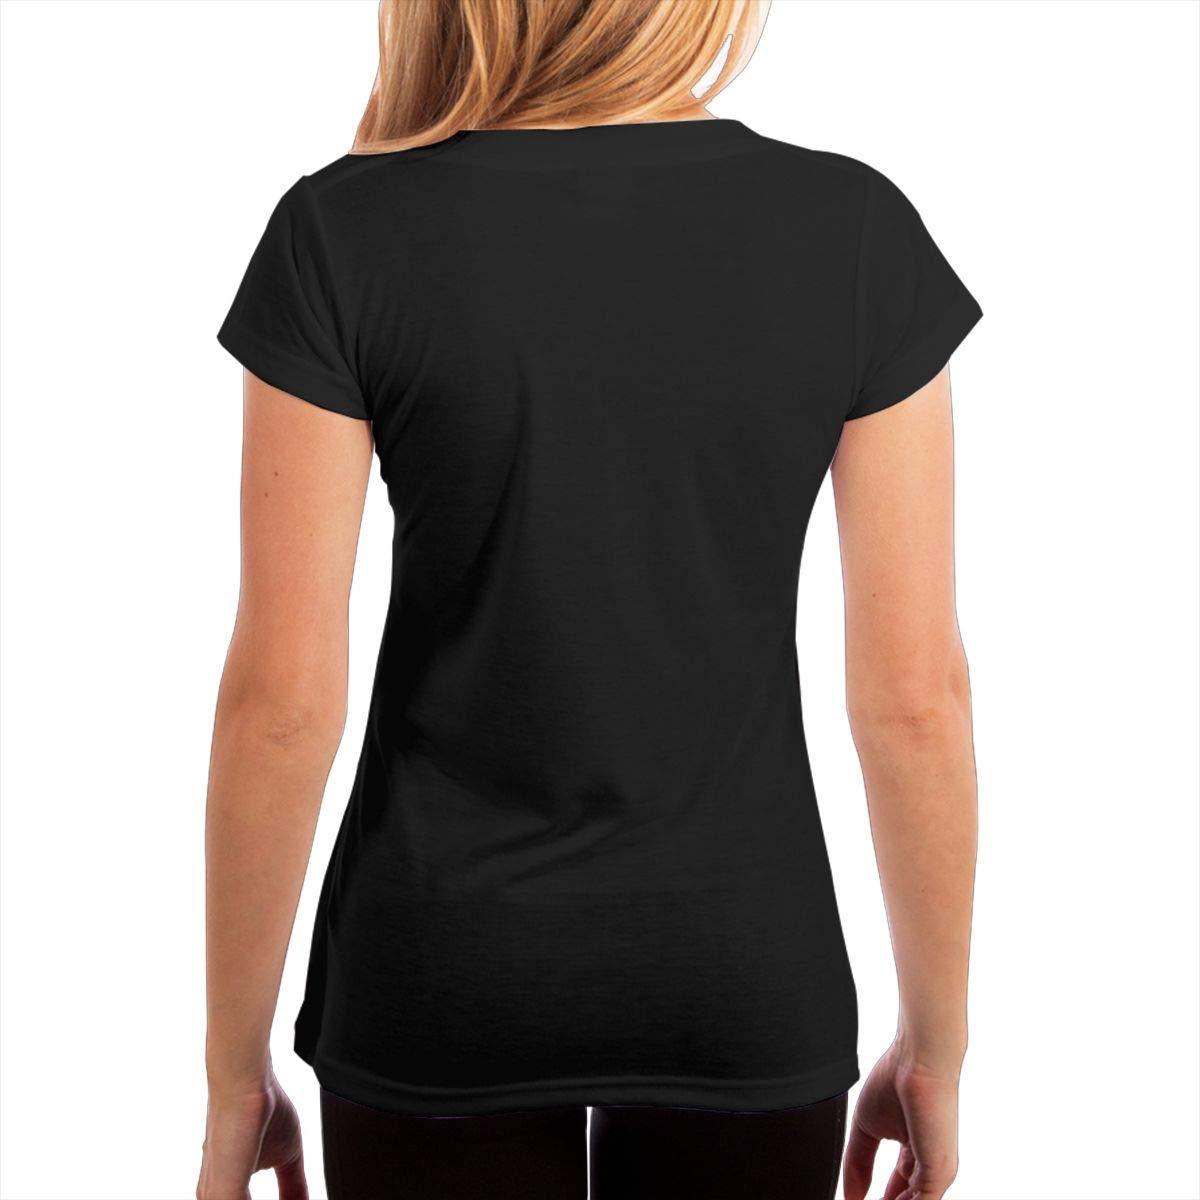 KshsDigu Match Box Twenty Womens V Neck Short Sleeve Tee Tops Cotton T-Shirts Black